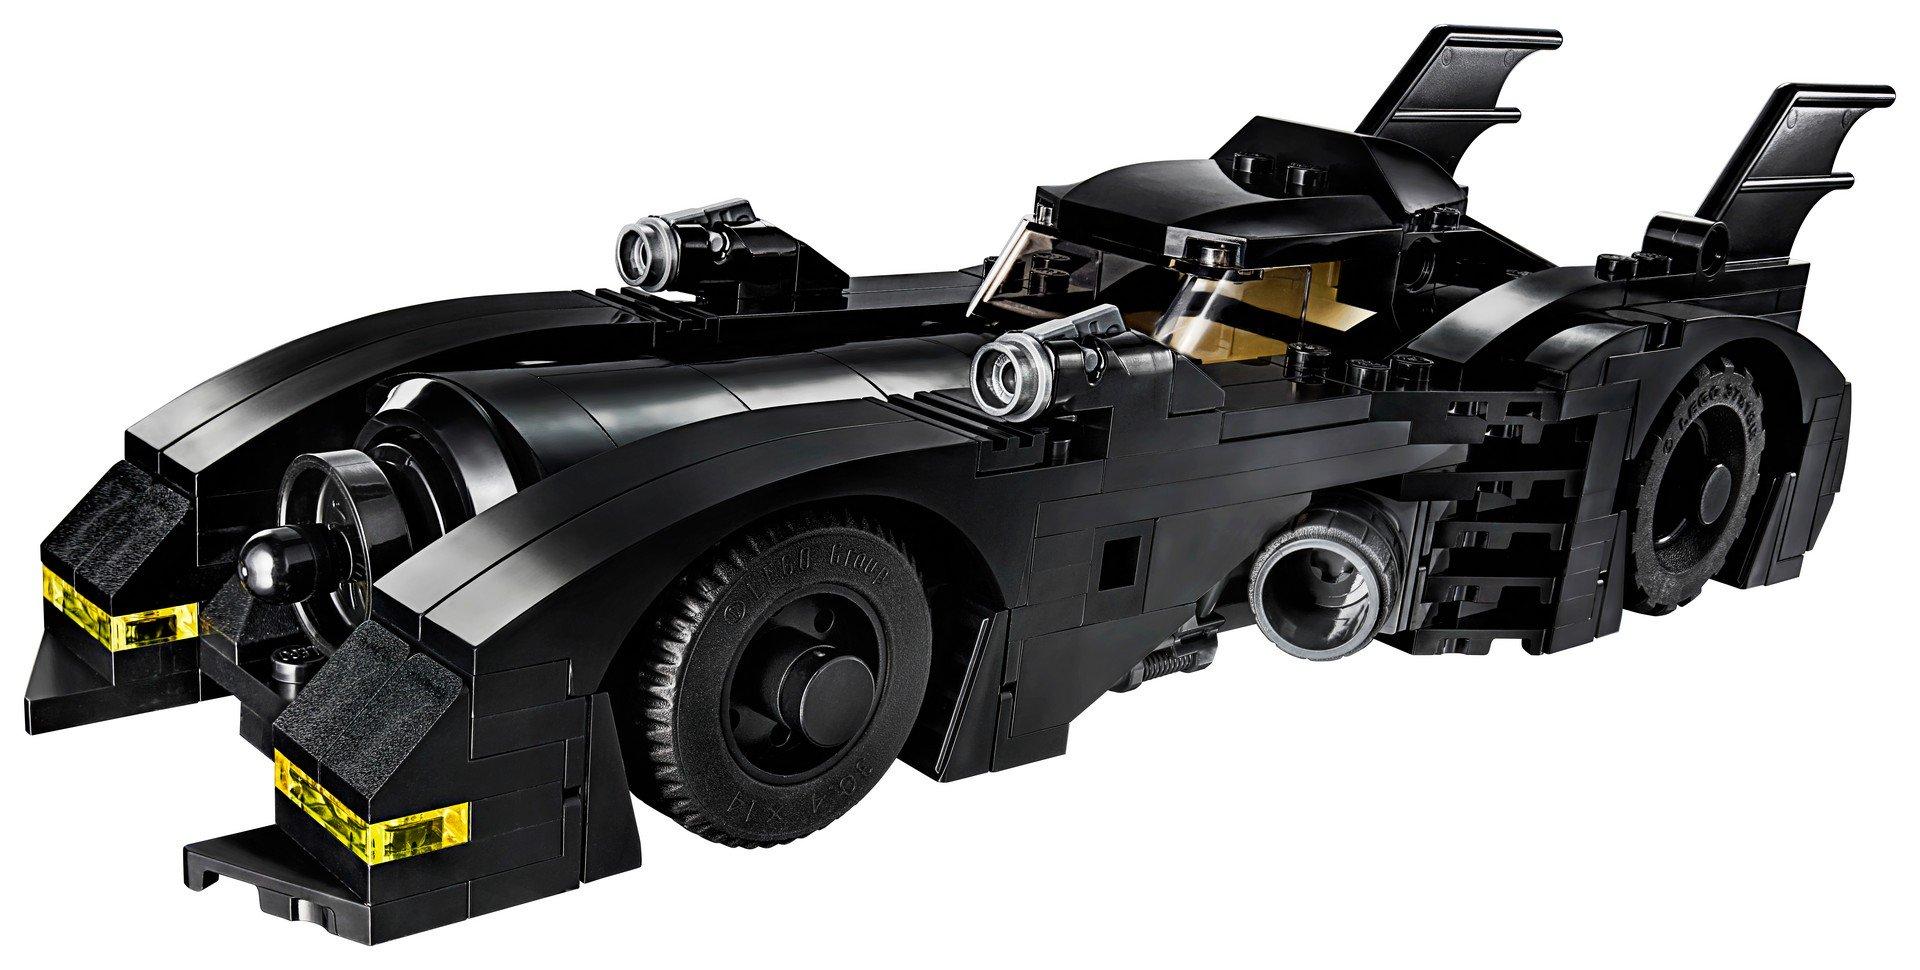 Lego-Batmobile-kit-1989-5